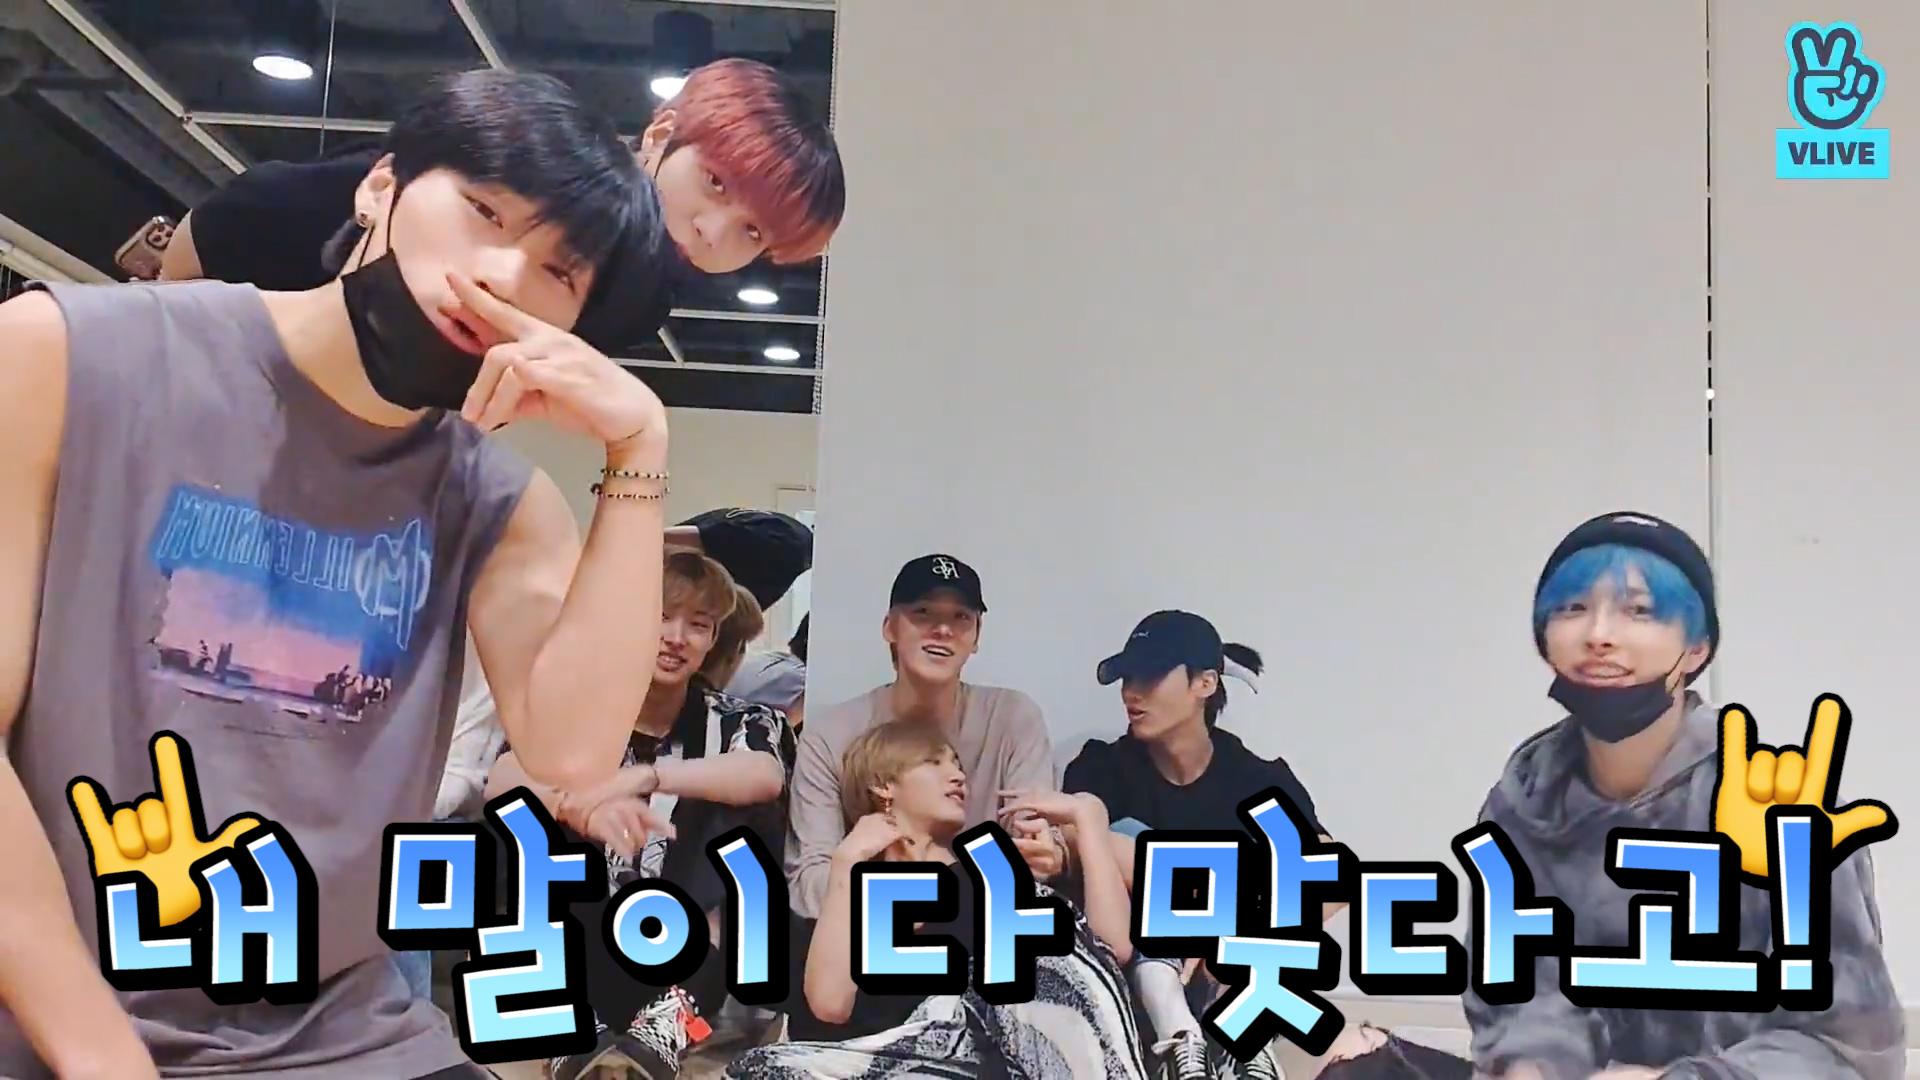 [ATEEZ] 내 말이 다 맞다고‼️ 에이티즈가 케이팝 정복한다고🤟 (ATEEZ talking about their new songs 'THANXX' & 'INCEPTION')